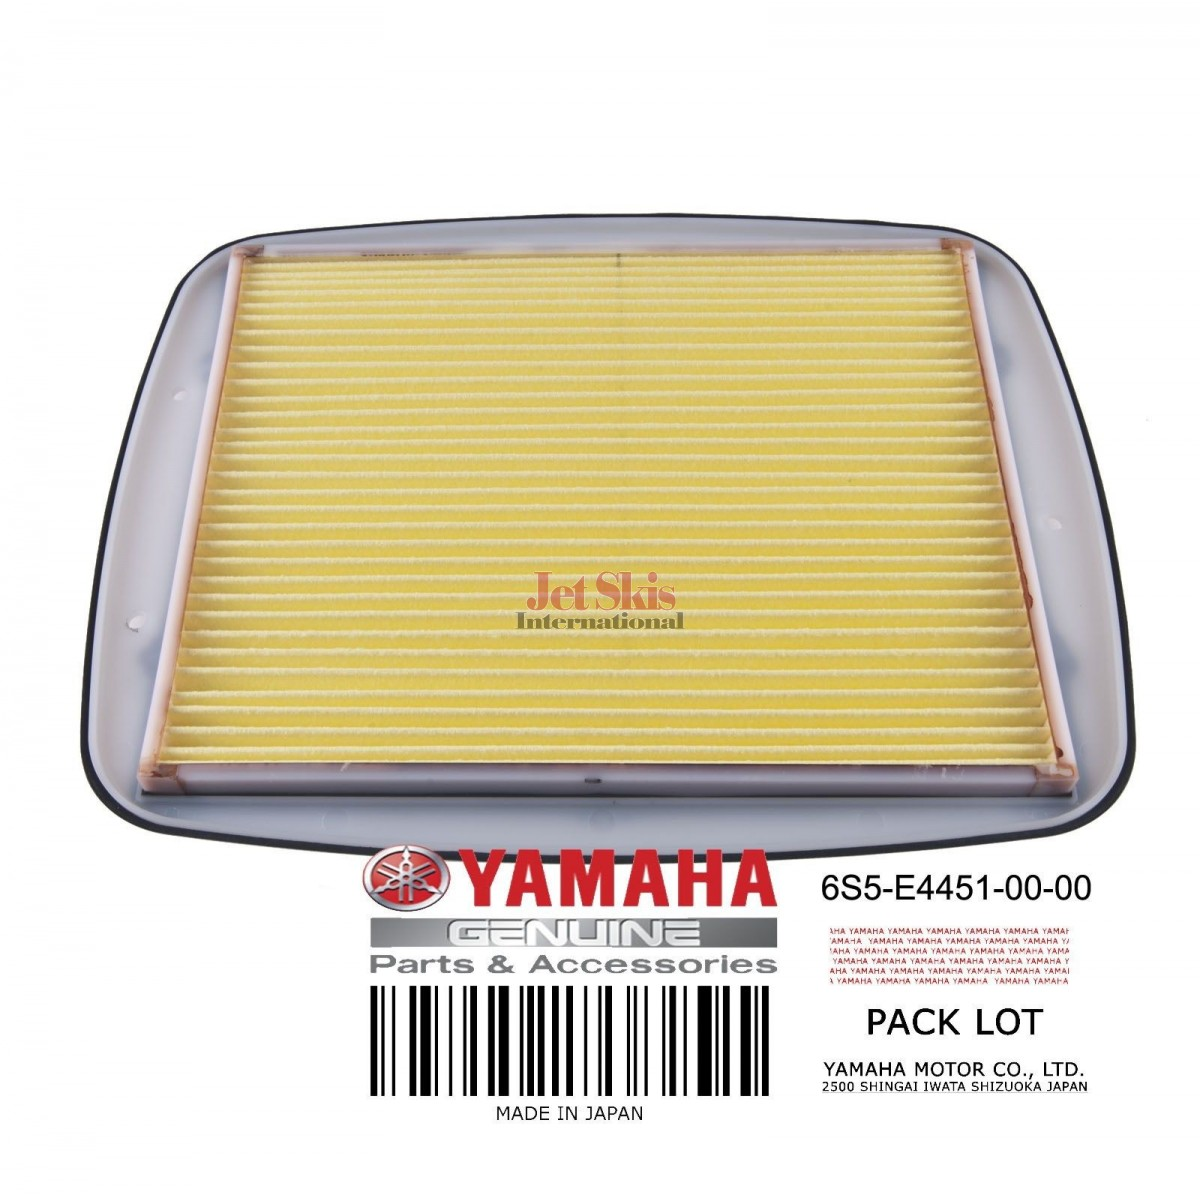 Yamaha Element Air Cleaner 6s5 E4451 00 Jet Skis International Waverunner Fuel Filter Original